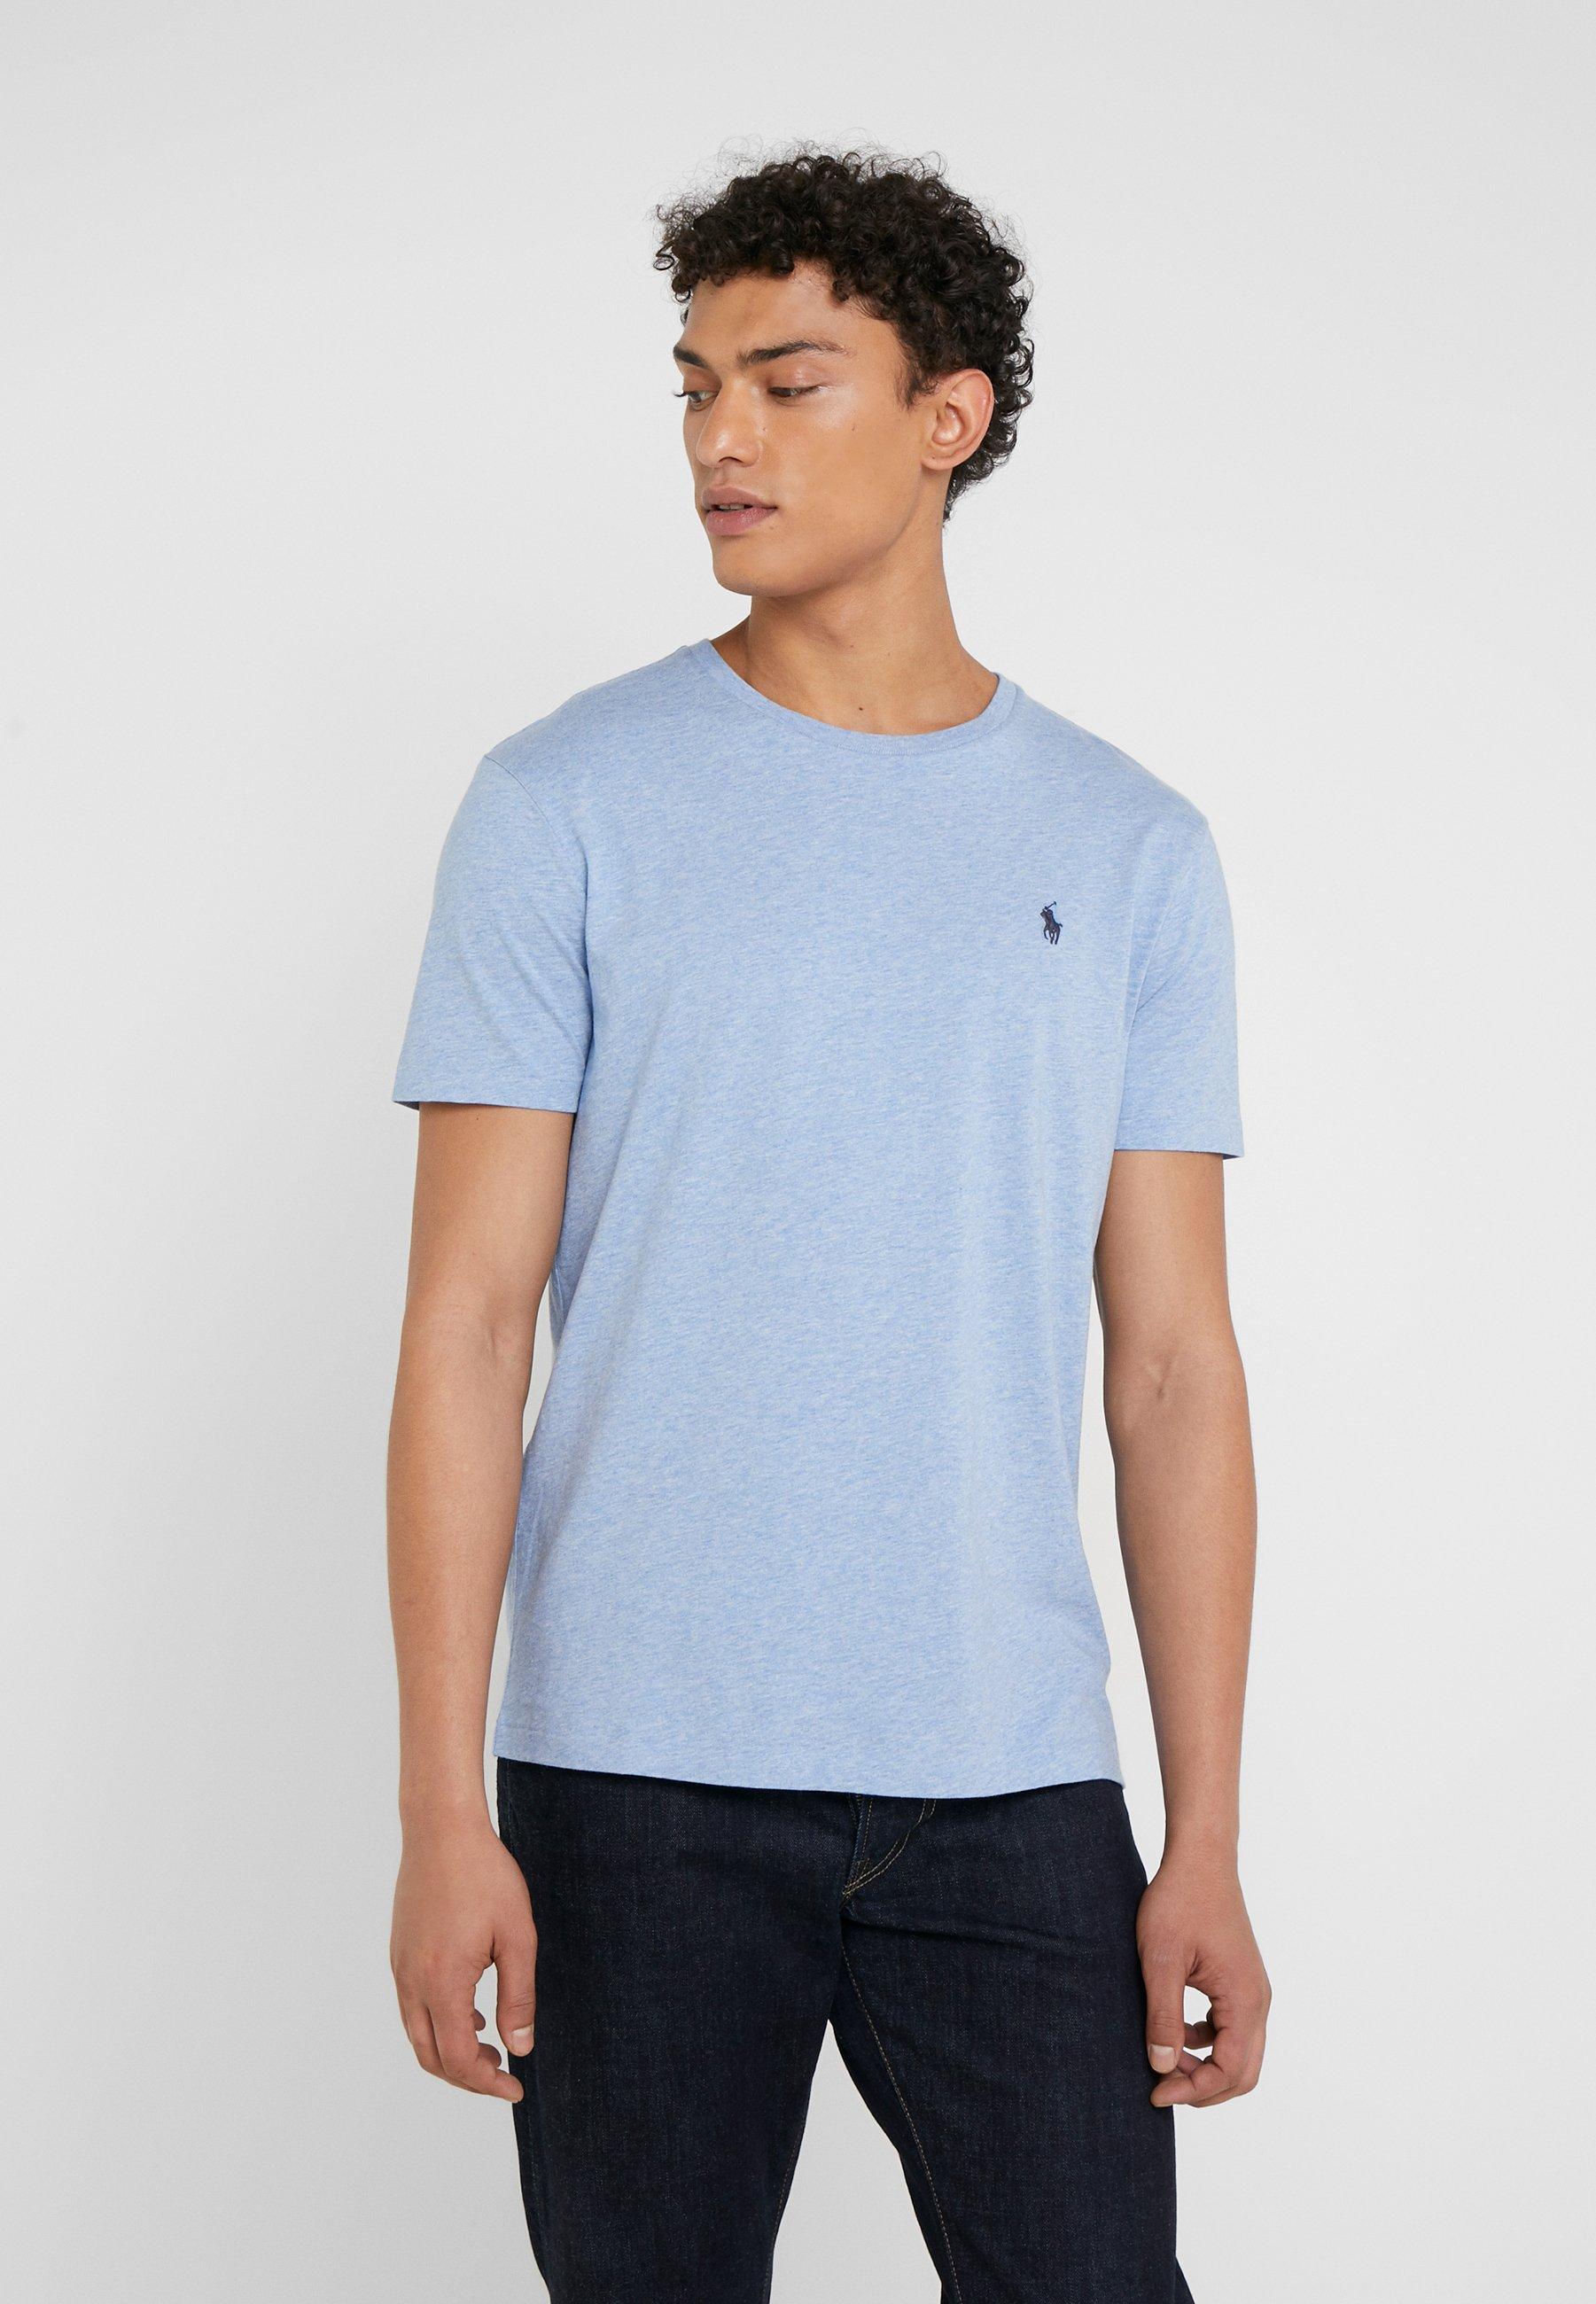 Uomo CUSTOM SLIM FIT JERSEY CREWNECK T-SHIRT - T-shirt basic